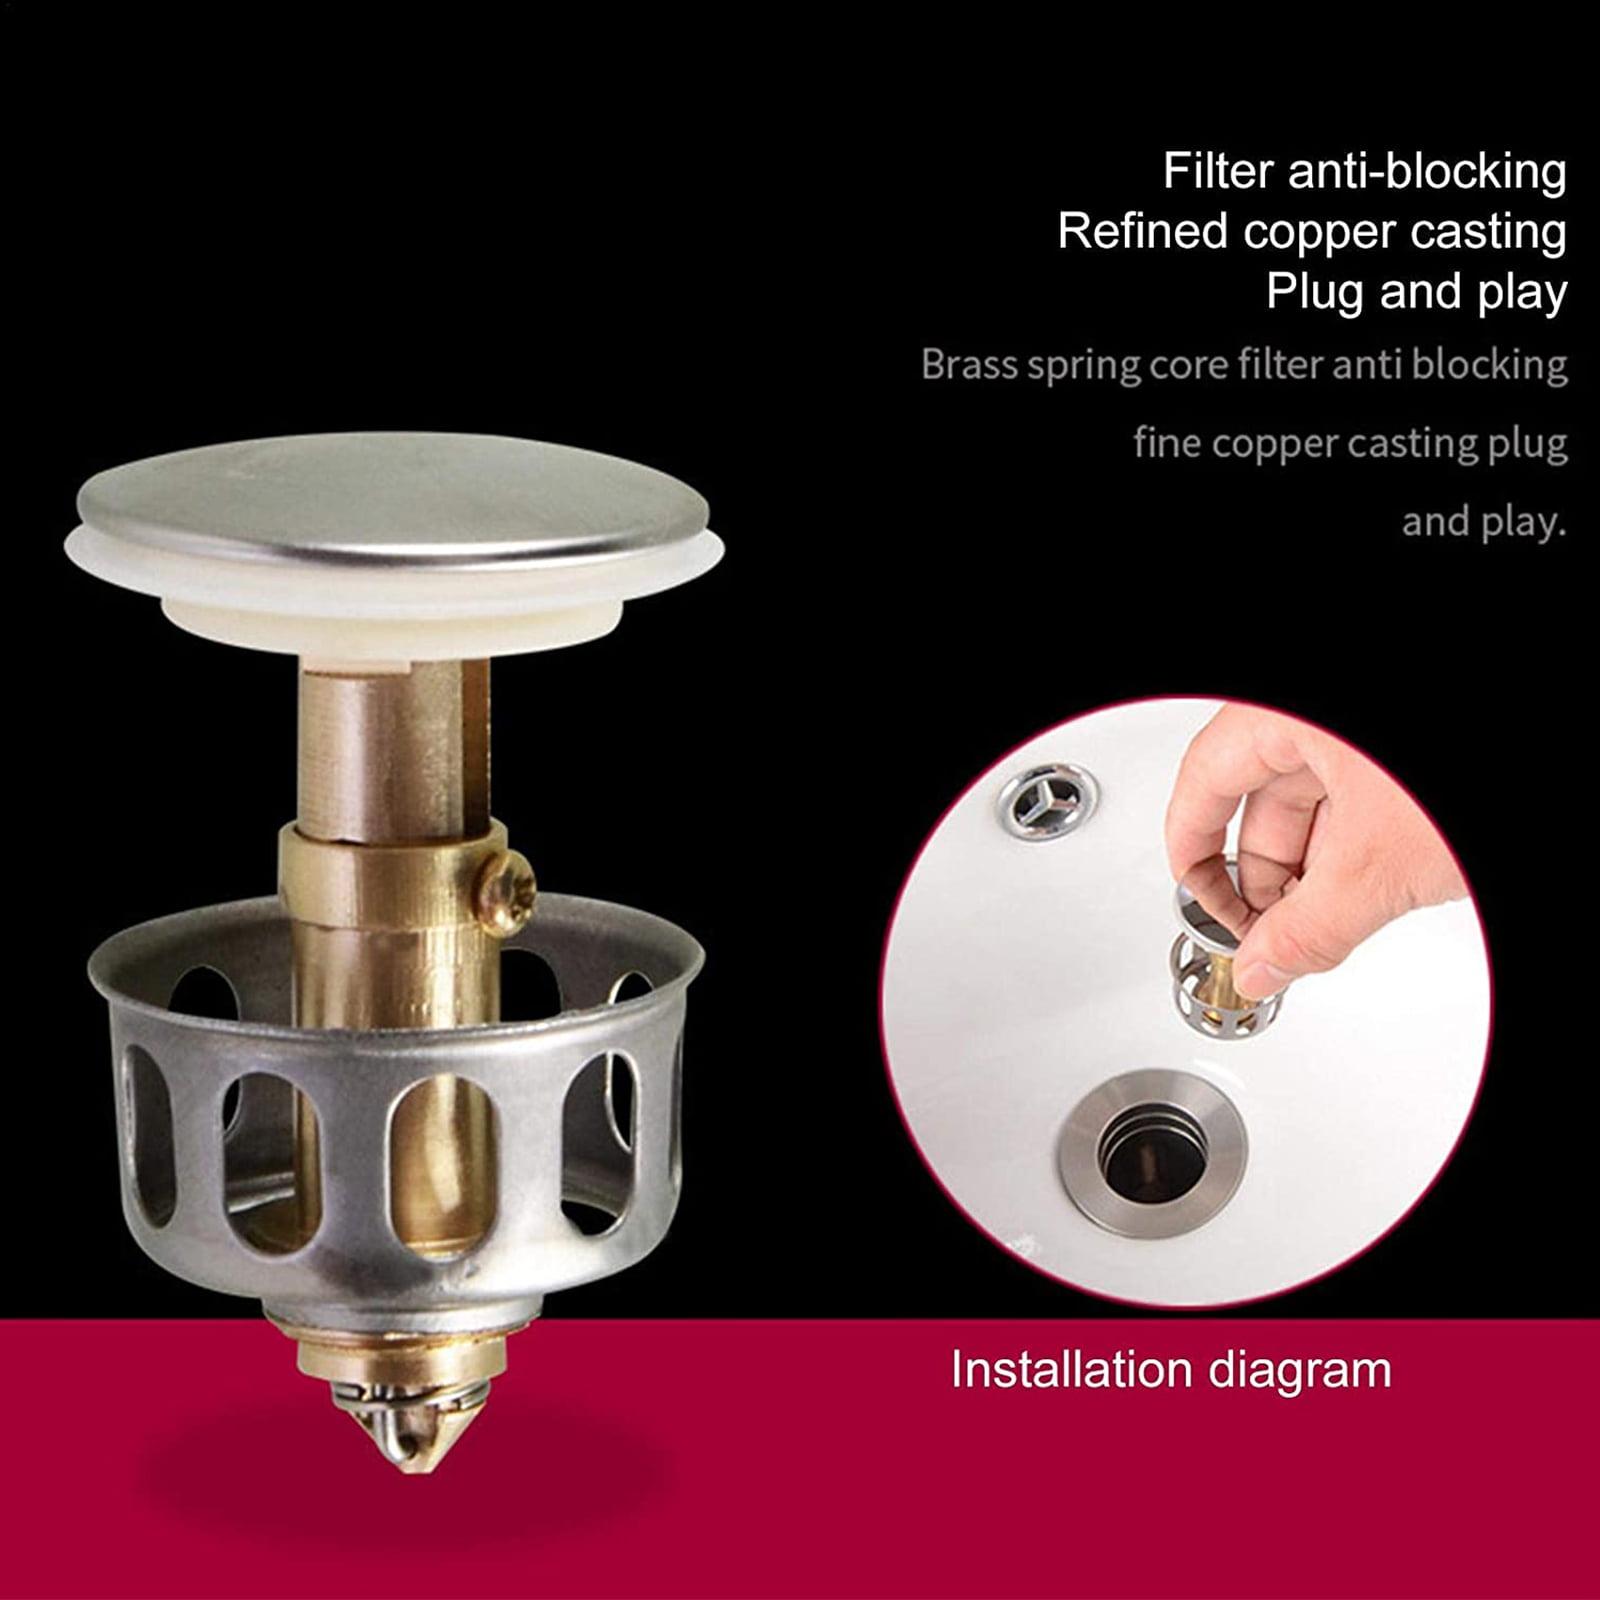 2Pcs Wash Basin Bounce Drain Filter Pop Up For Bathroom Sink Drain Plugs 35mm US